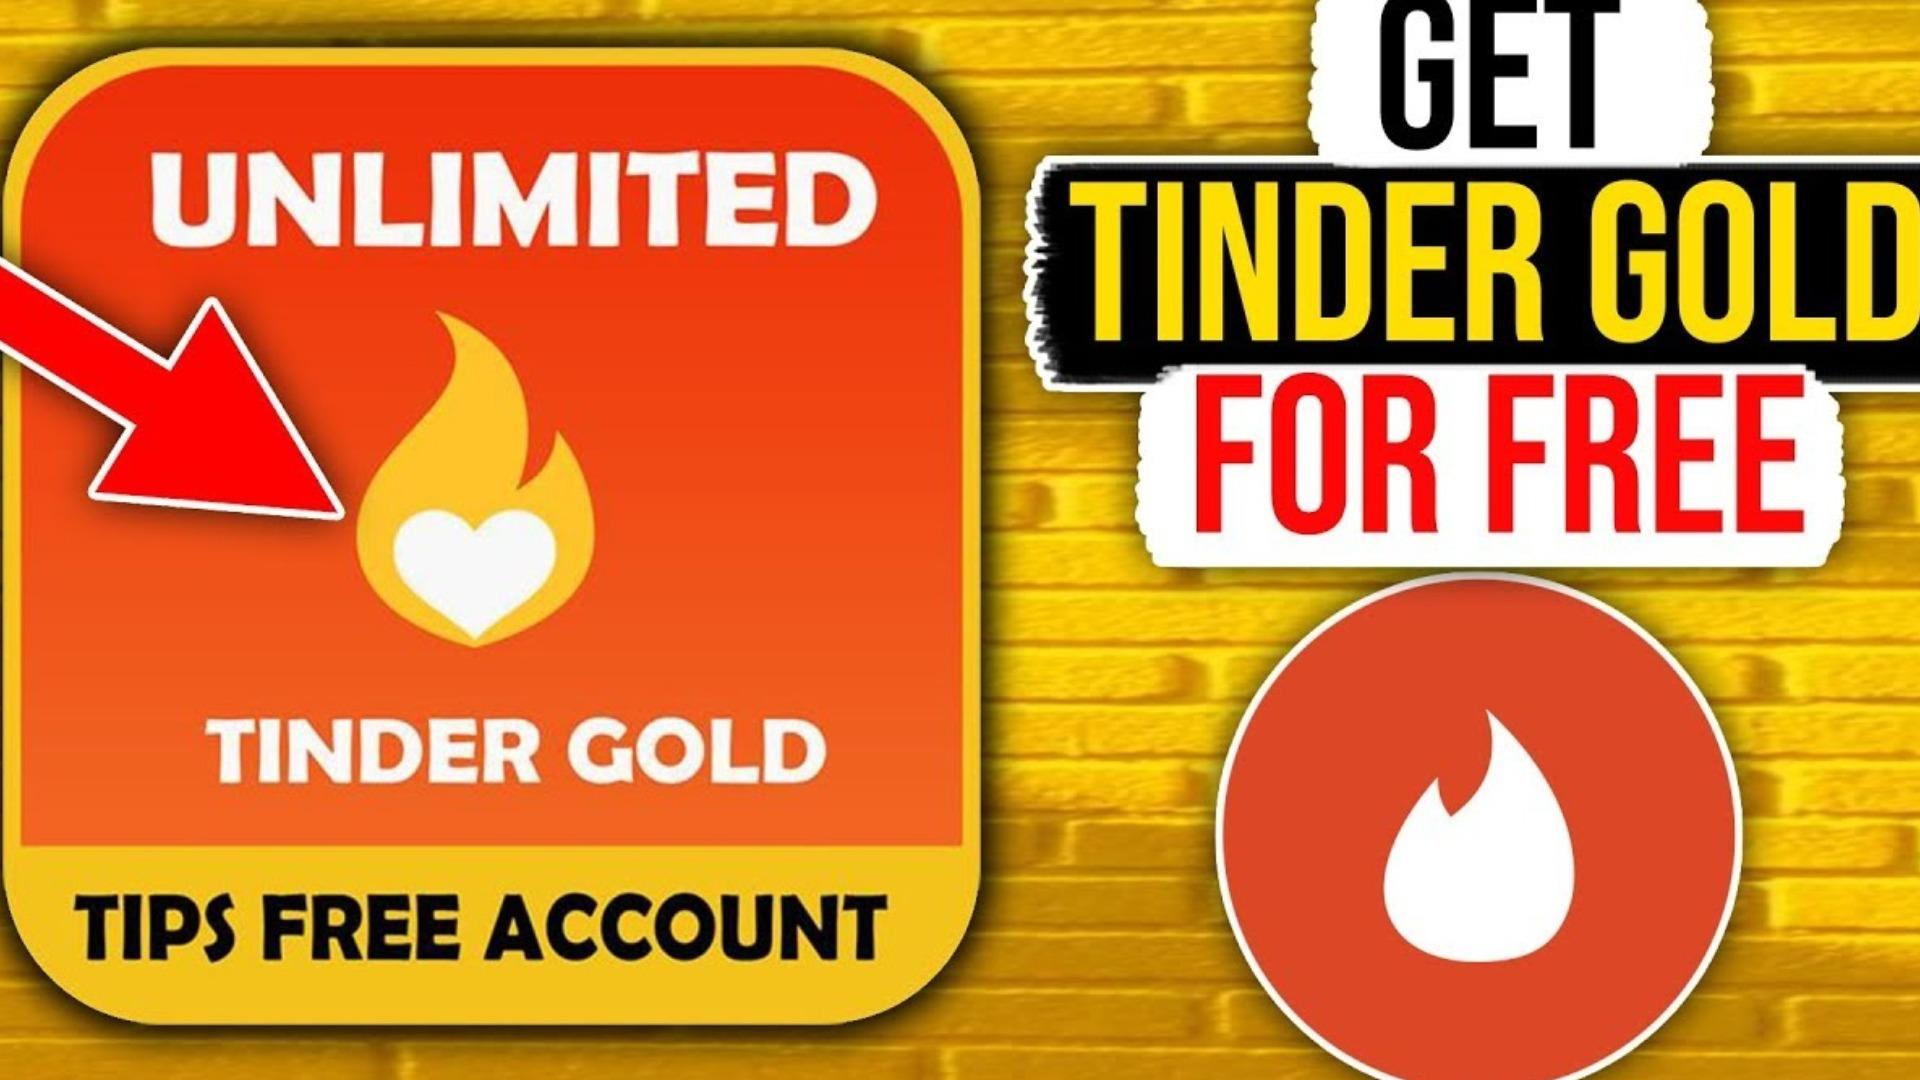 Tinder Gold Premium Membership Generator For Android & iOs